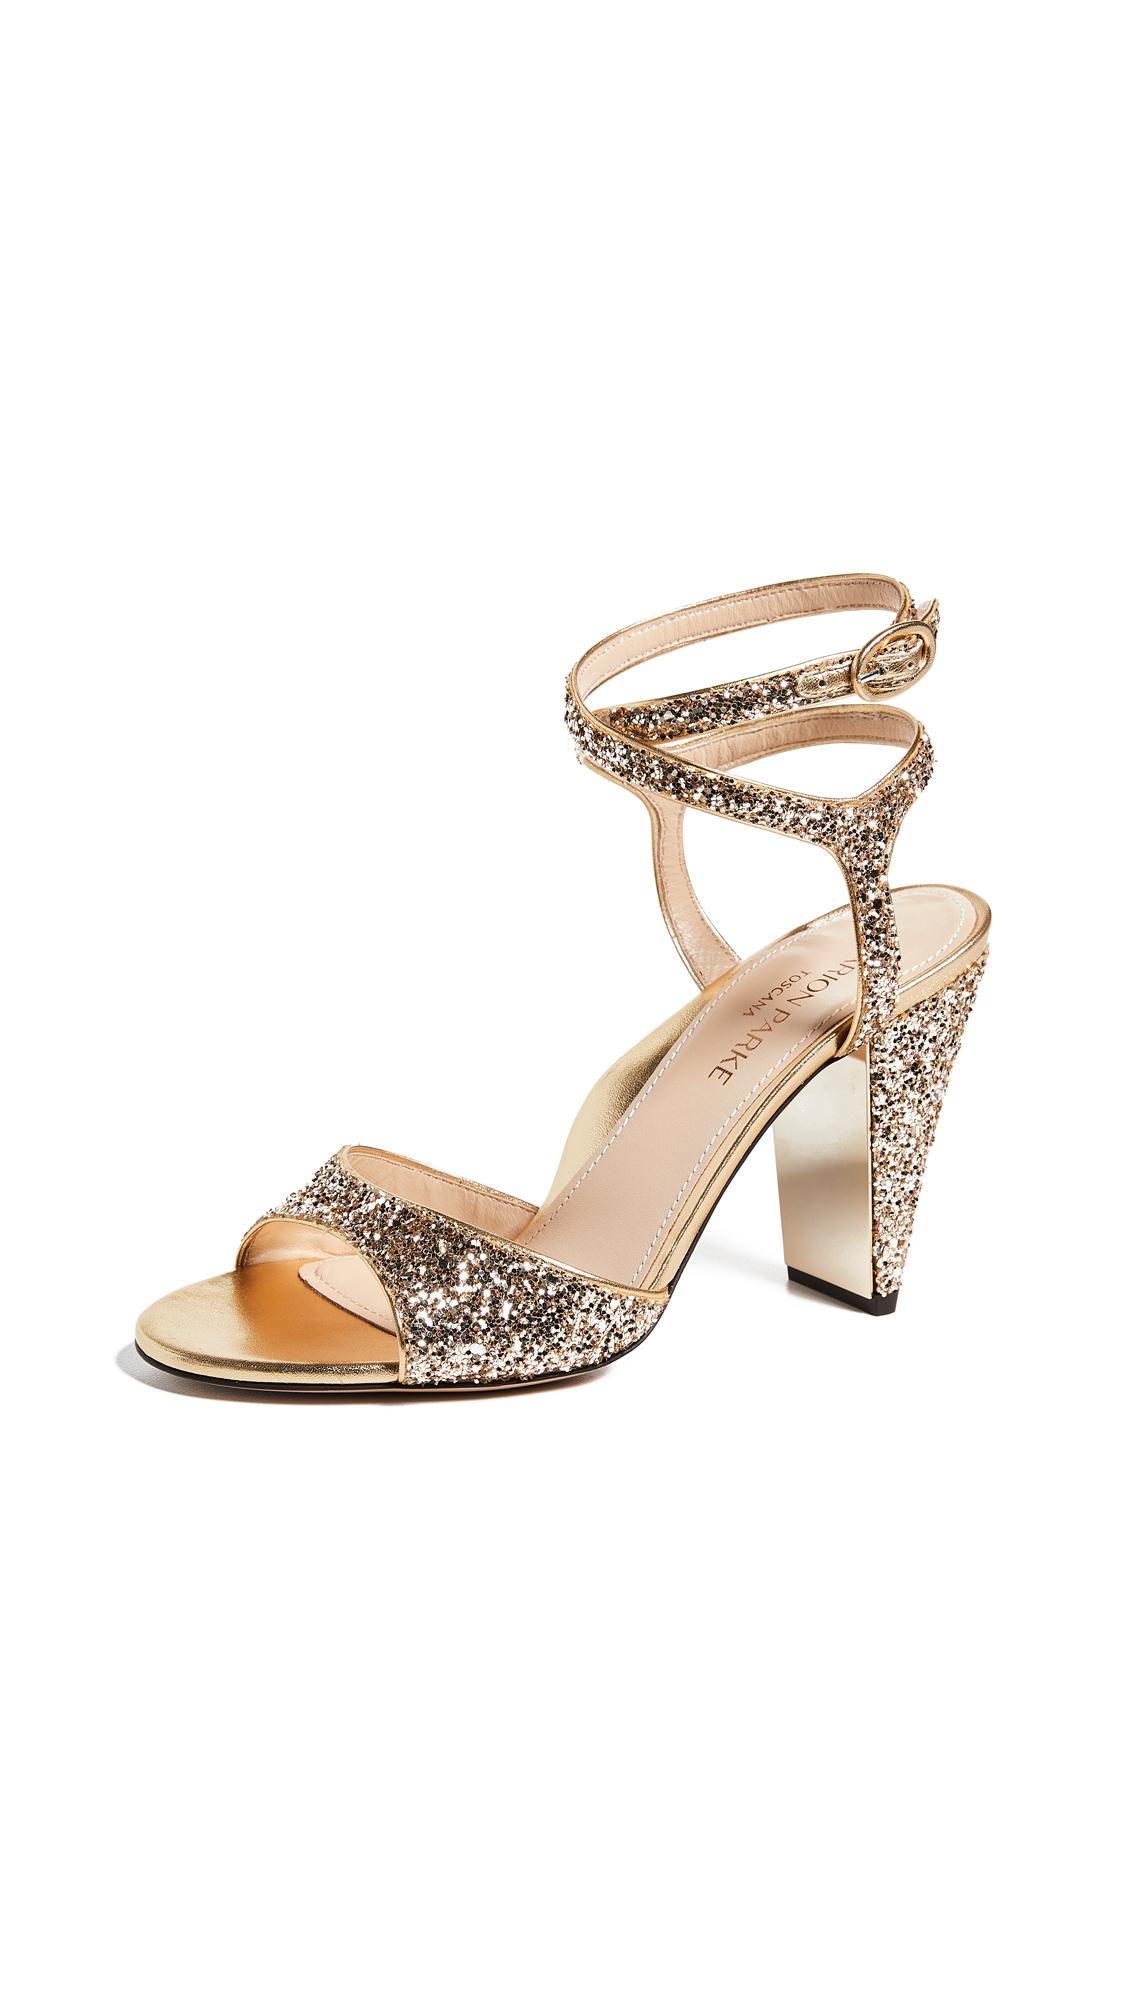 Marion Parke Loretta SP Sandals - Champagne Glitter